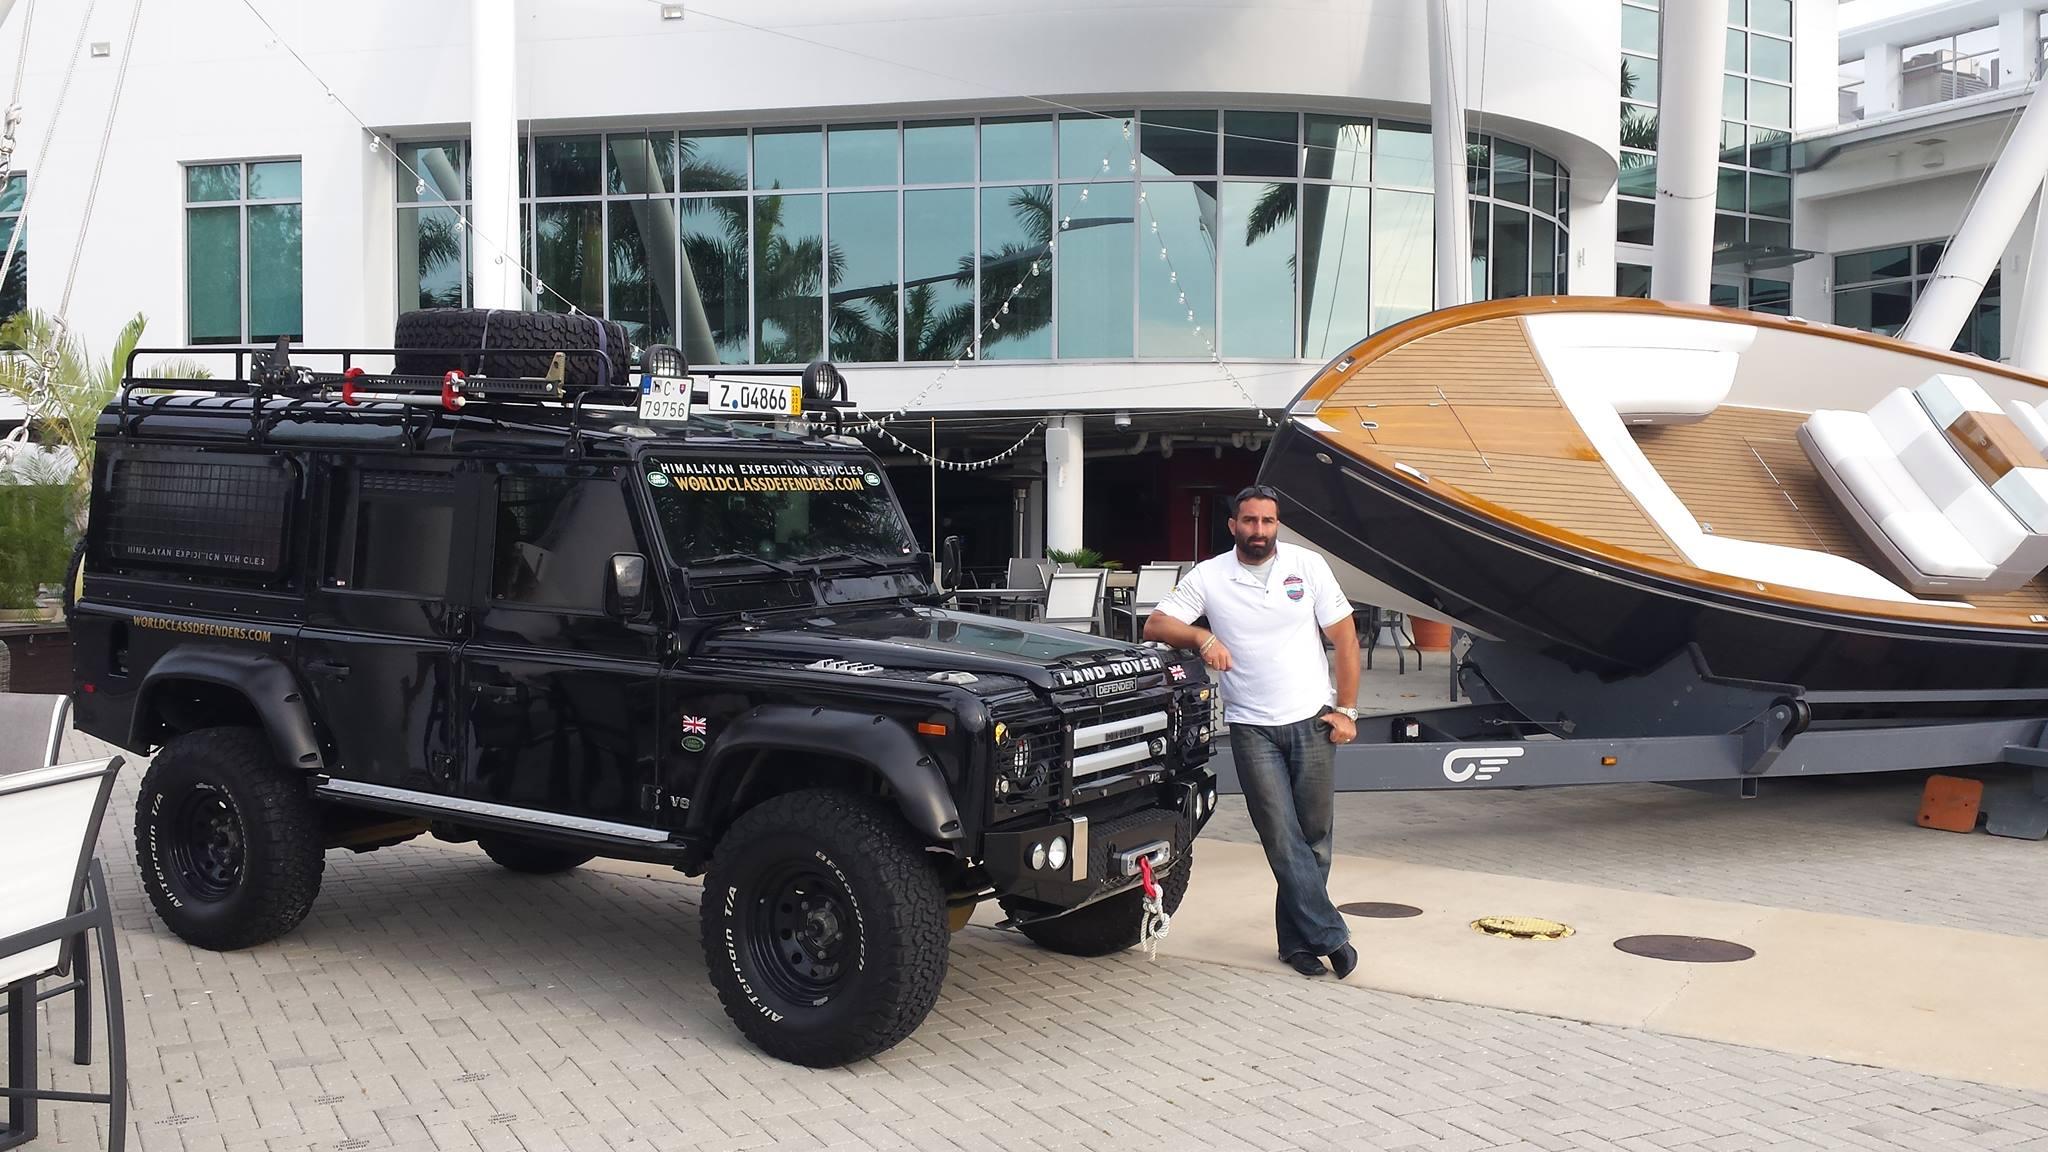 Cesta Land Rovera ze Slovenska na Floridu